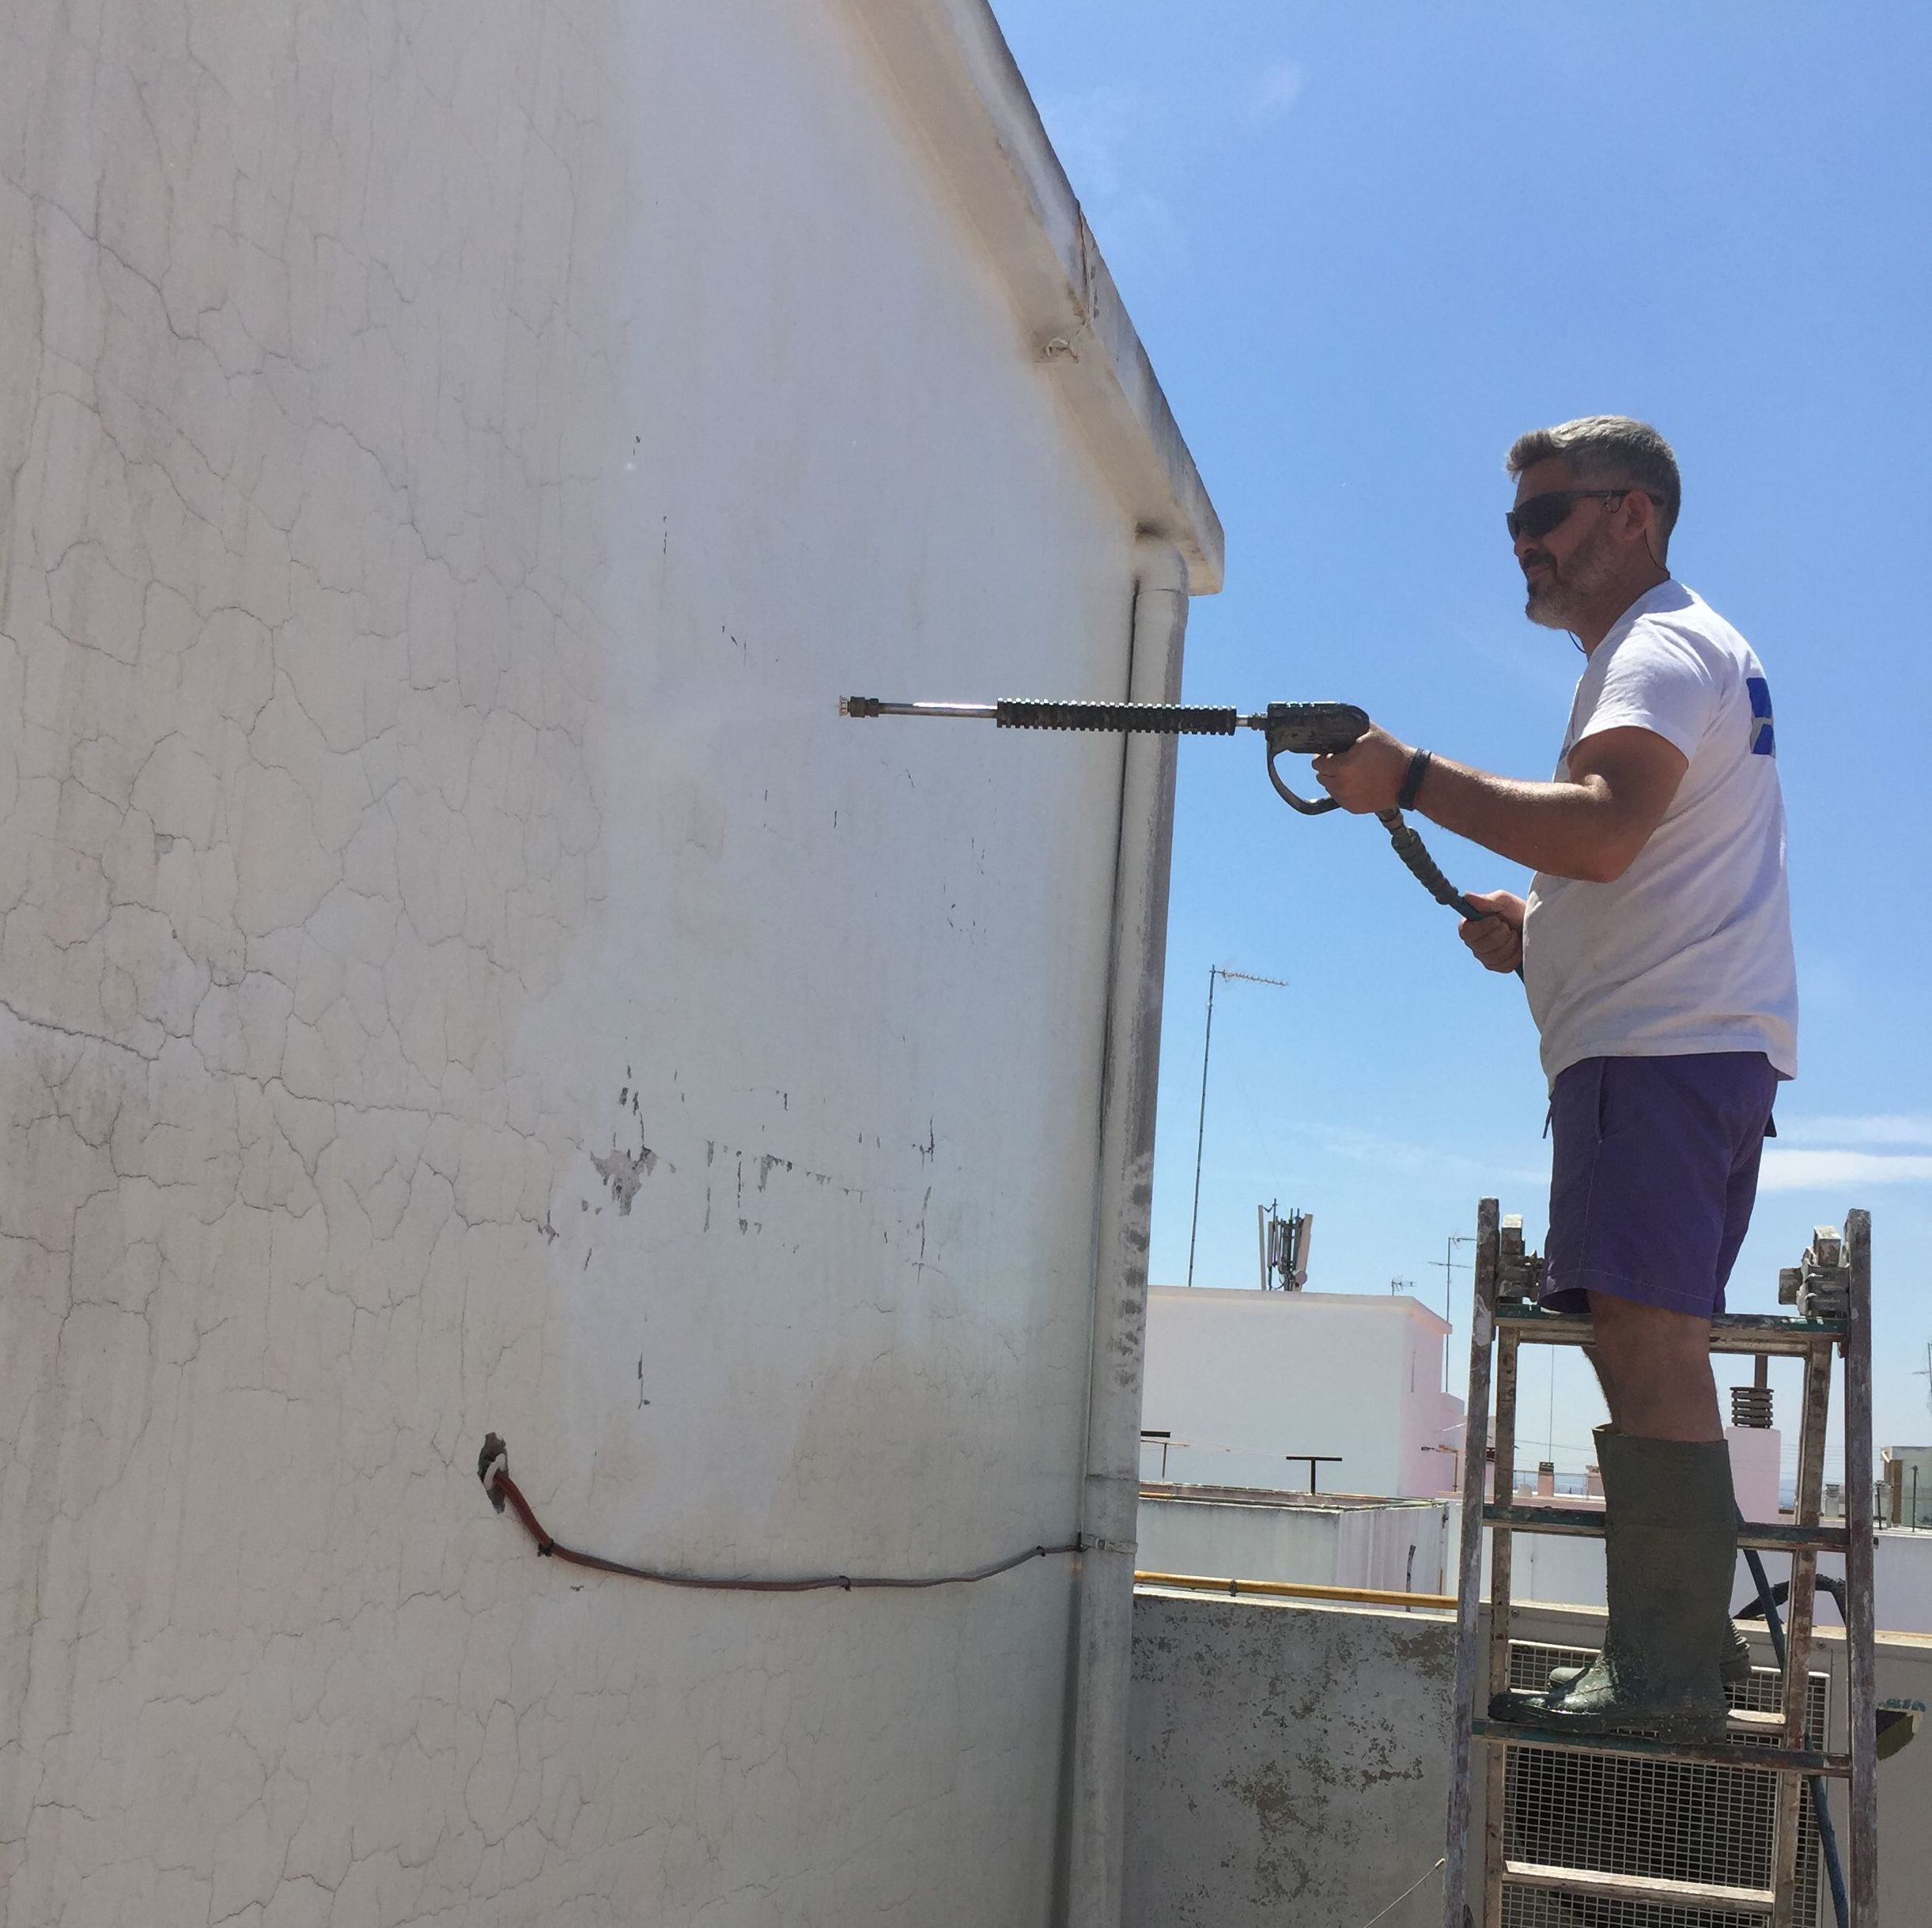 Limpieza de fachada con chorro de agua